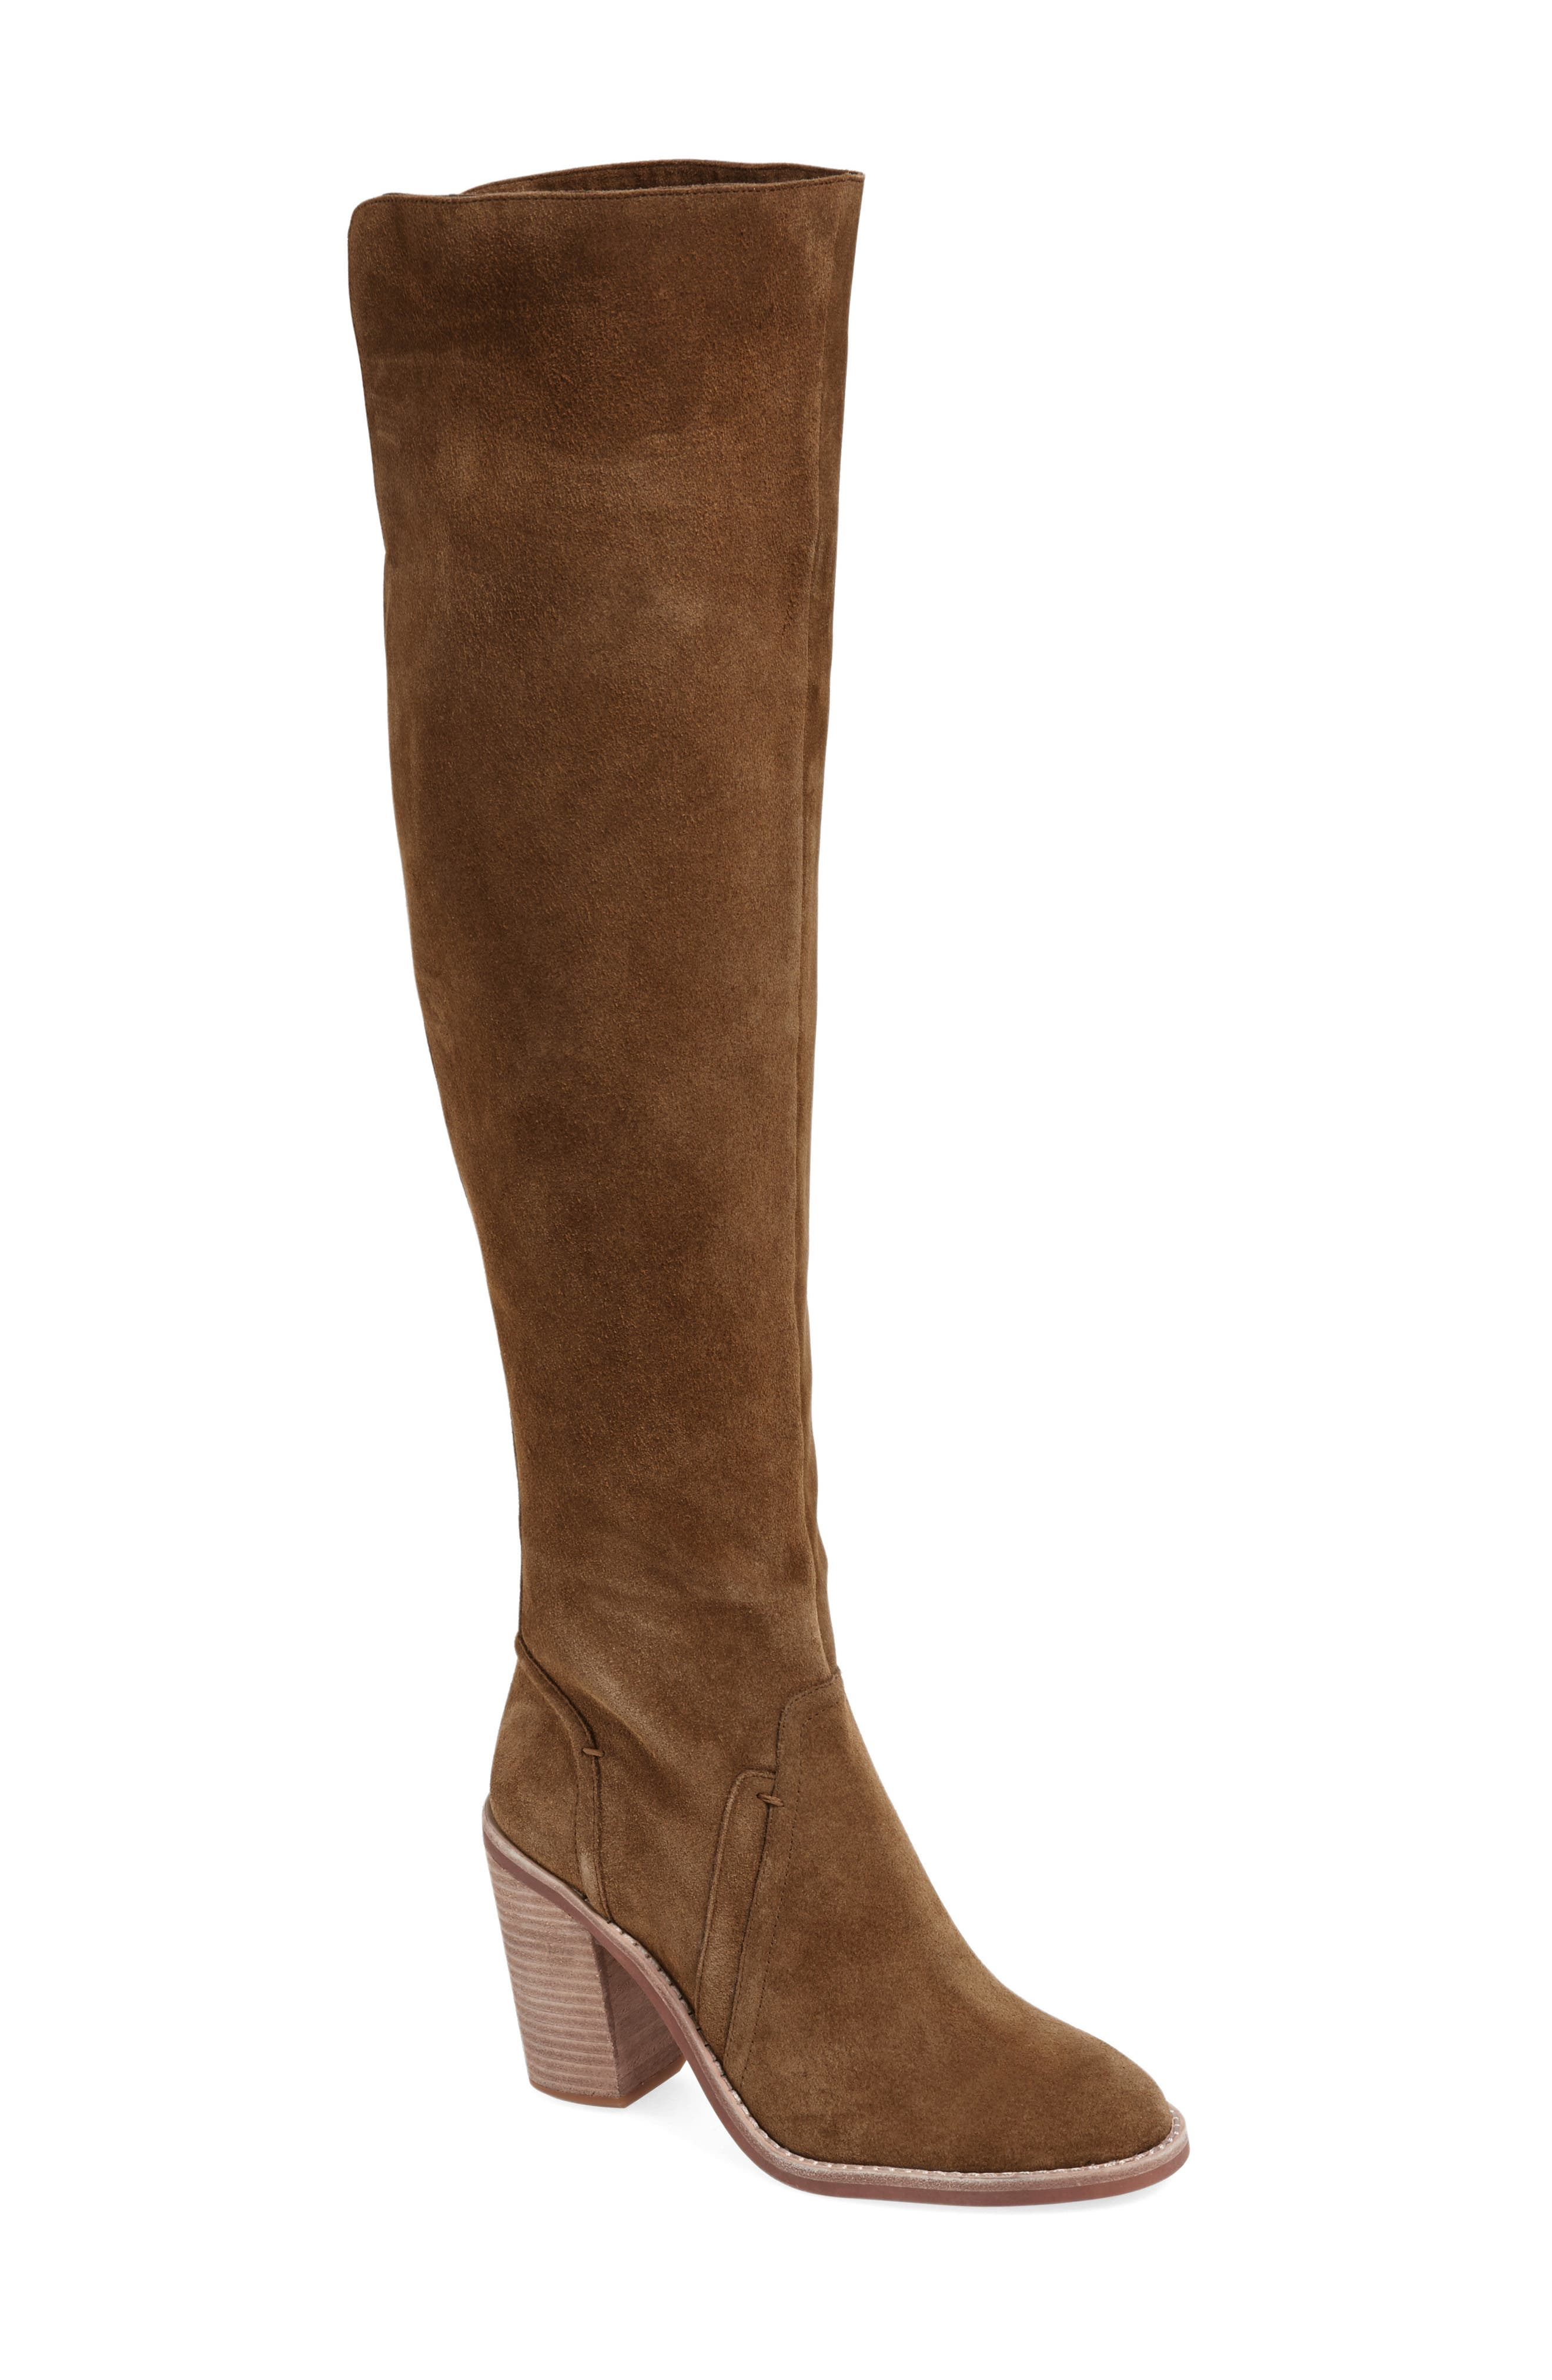 'Melaya' Over the Knee Boot,                         Main,                         color, Bark Verona Suede